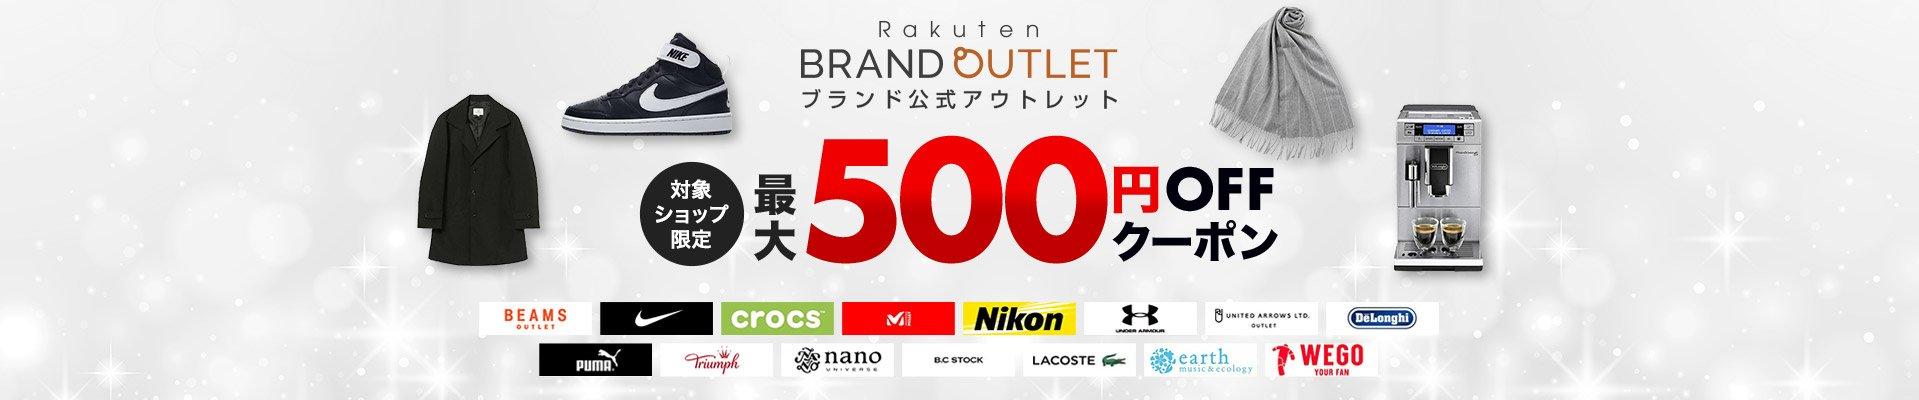 Rakuten Brand Outlet|クーポンキャンペーン